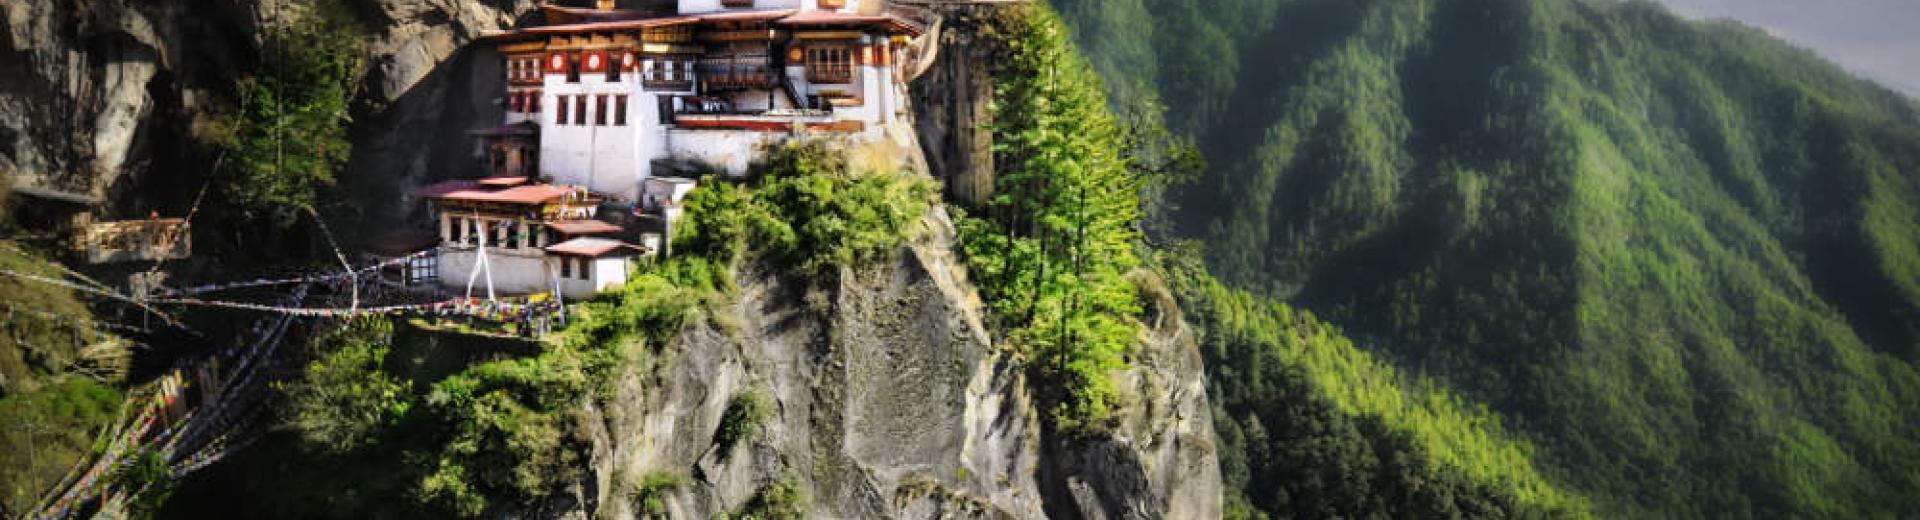 bhutan tigersnest